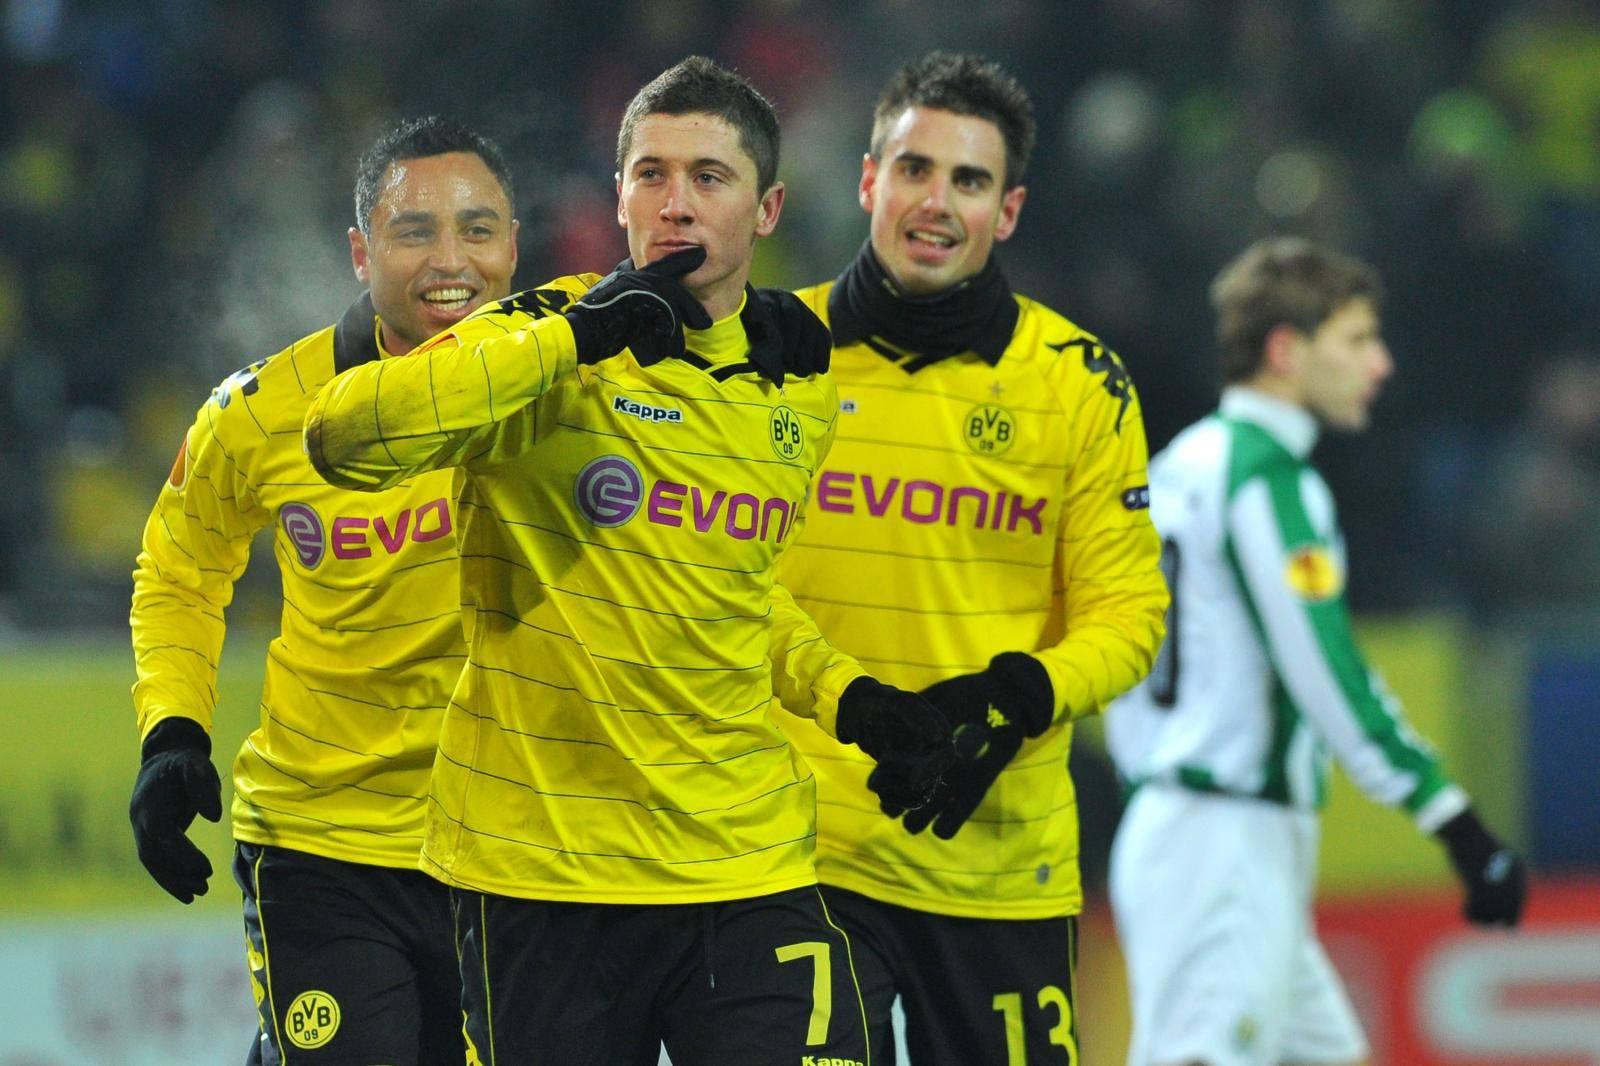 Europe League - Borussia Dortmund - Karpaty Lviv